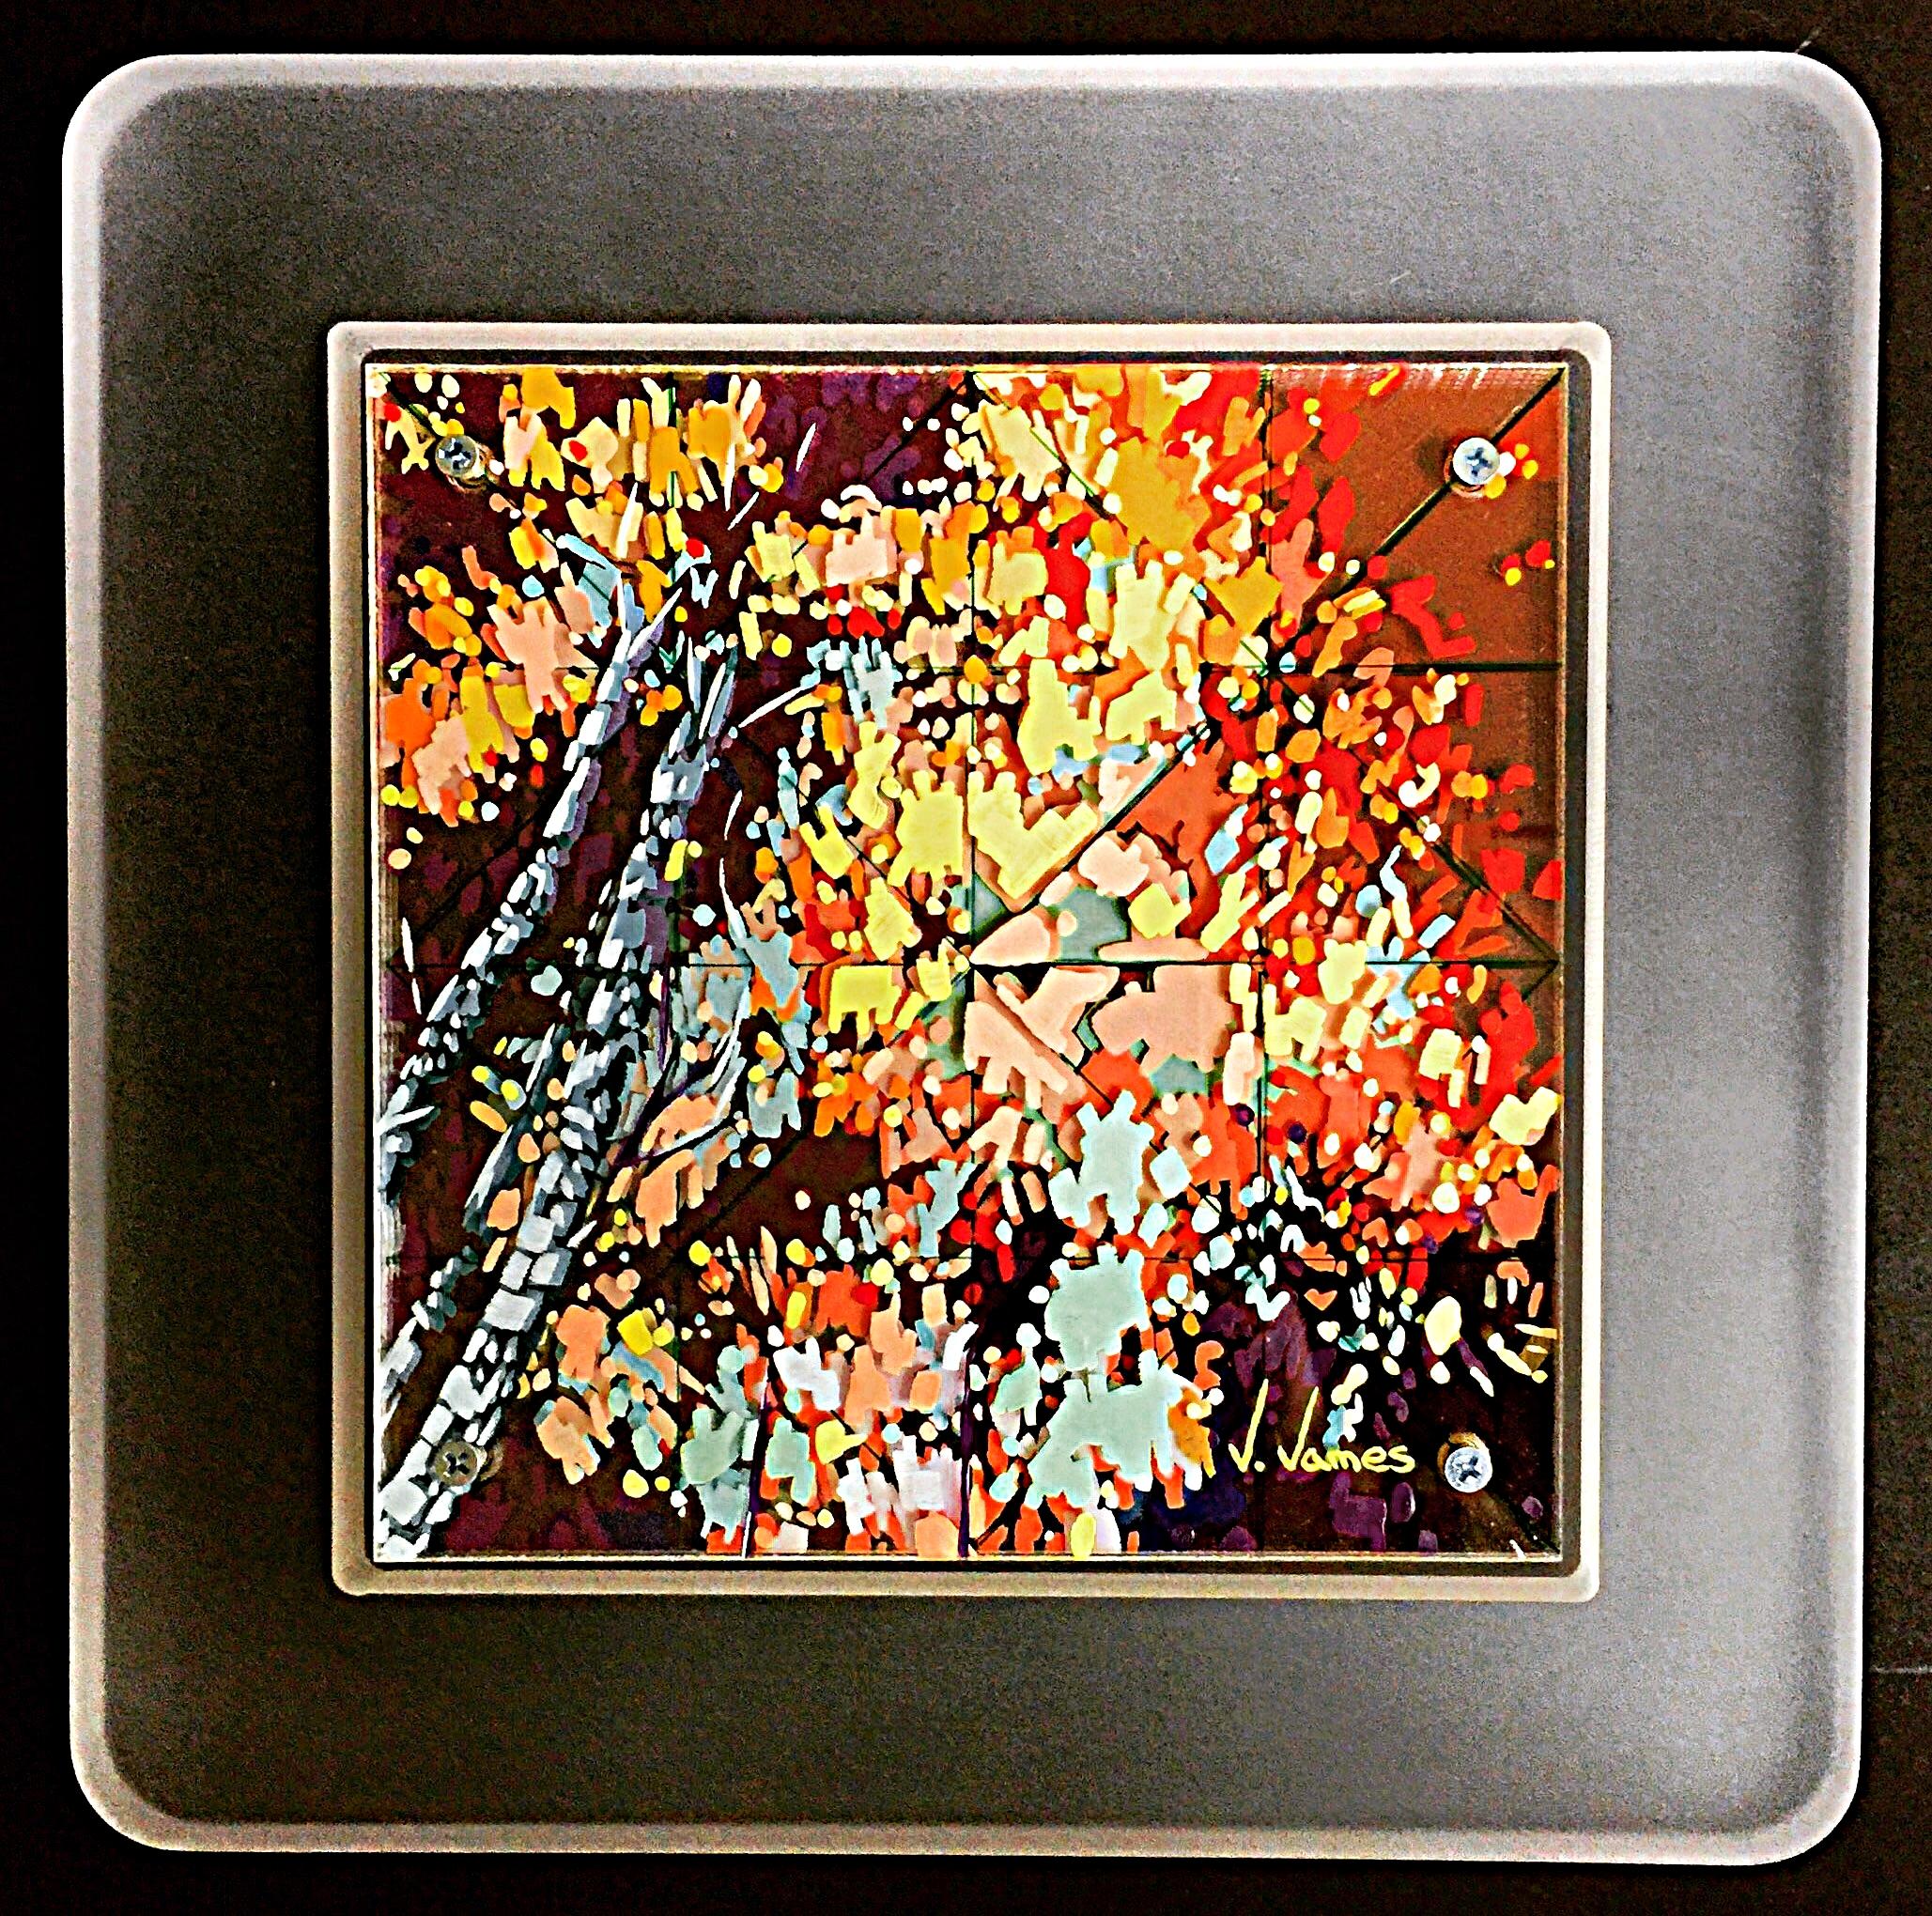 "Wind Chimes, 8"" x 8"" Acrylic on Multi-Layered Acrylic Glass"